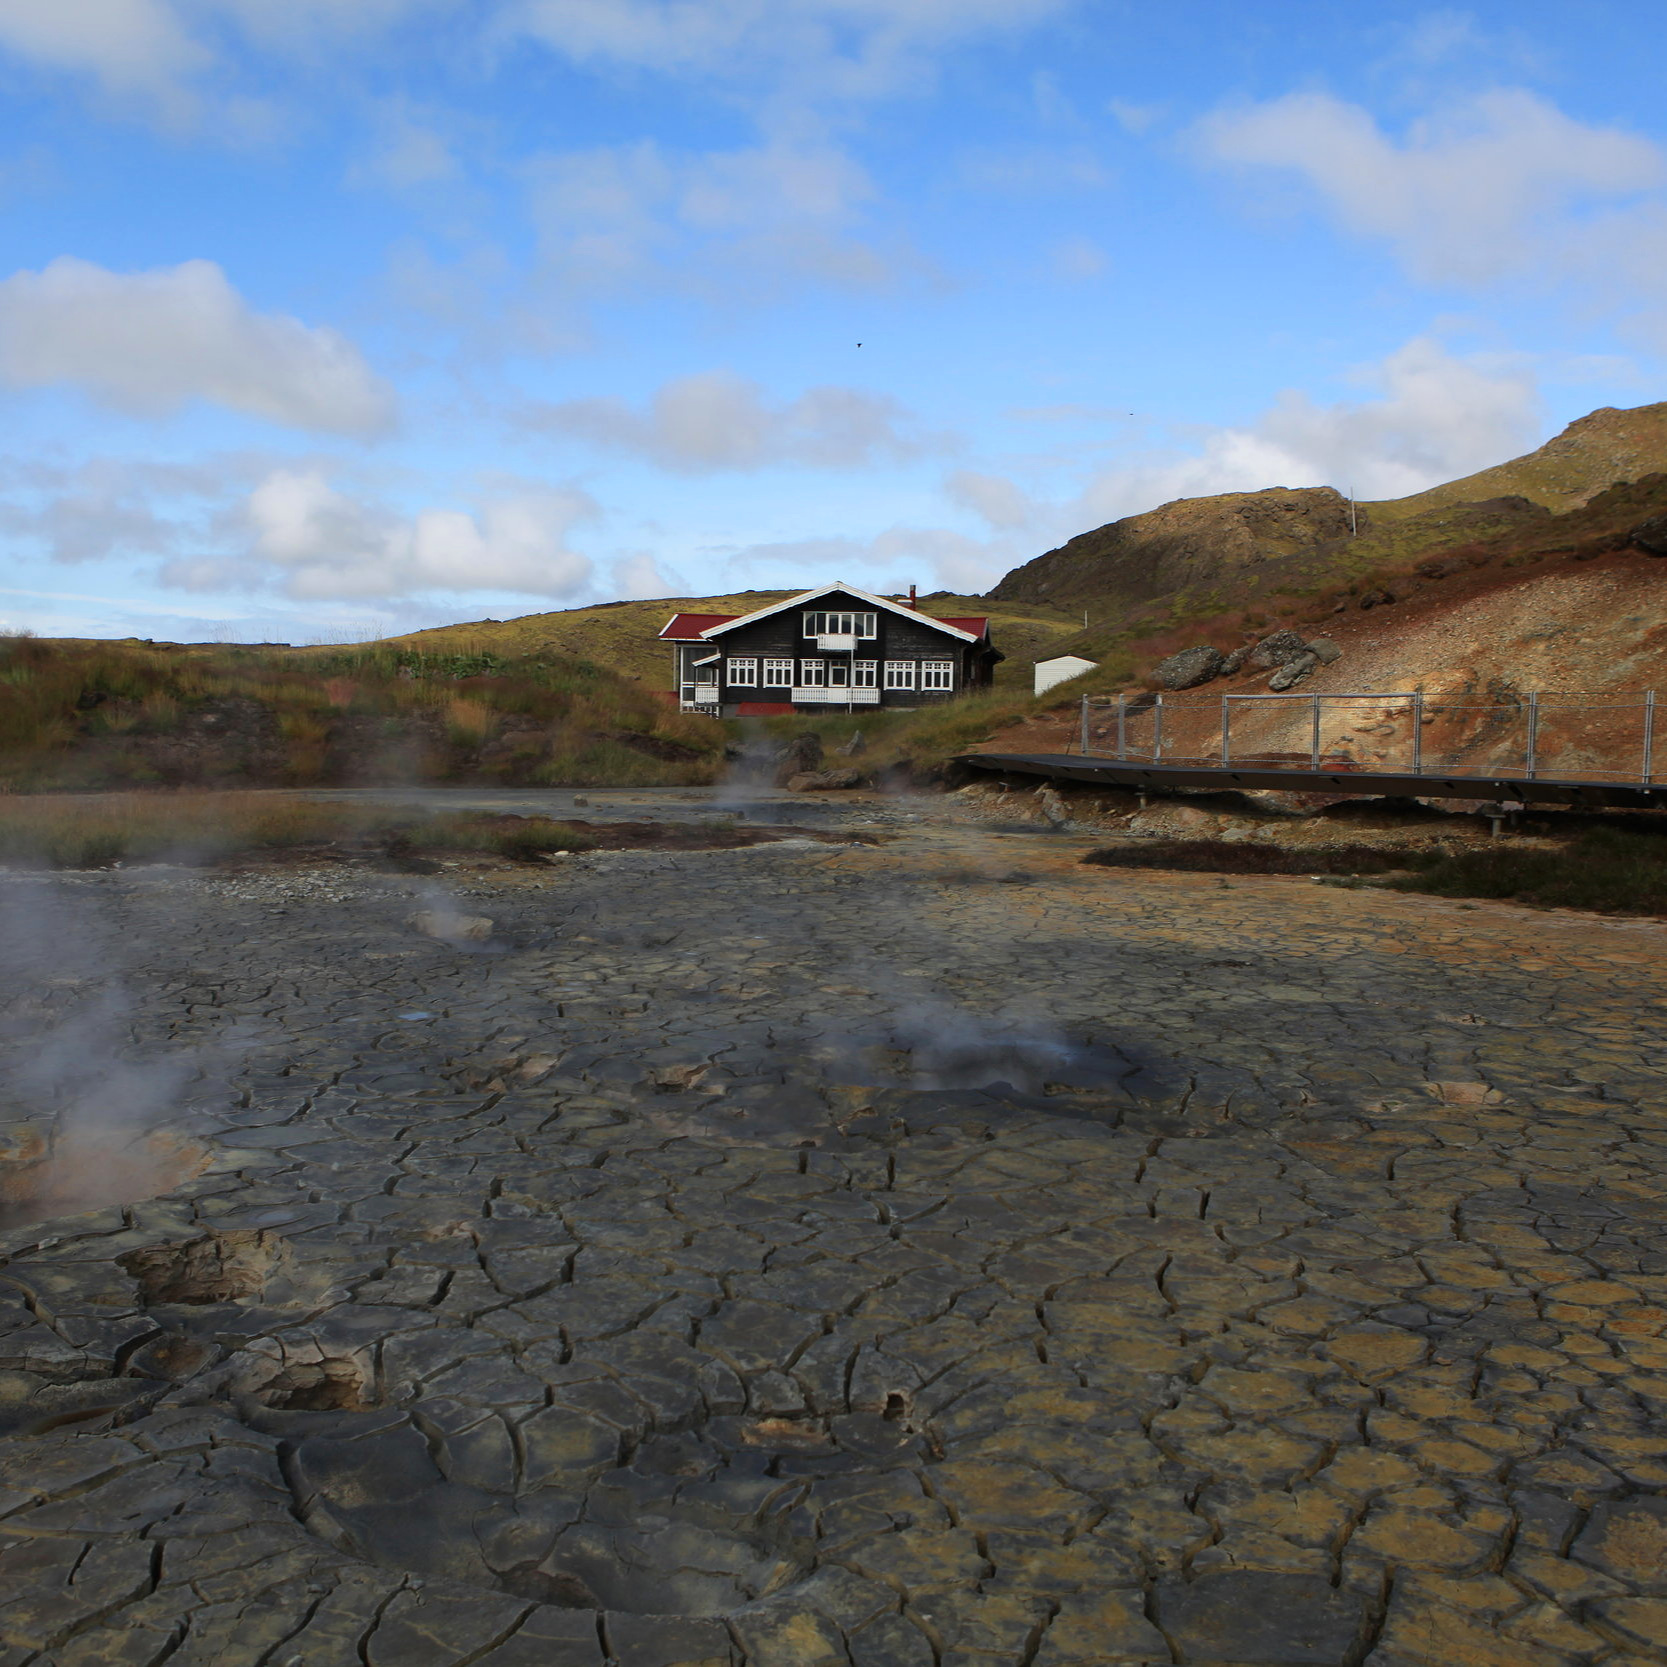 Haus in Island nähe Seltún Geothermal Area